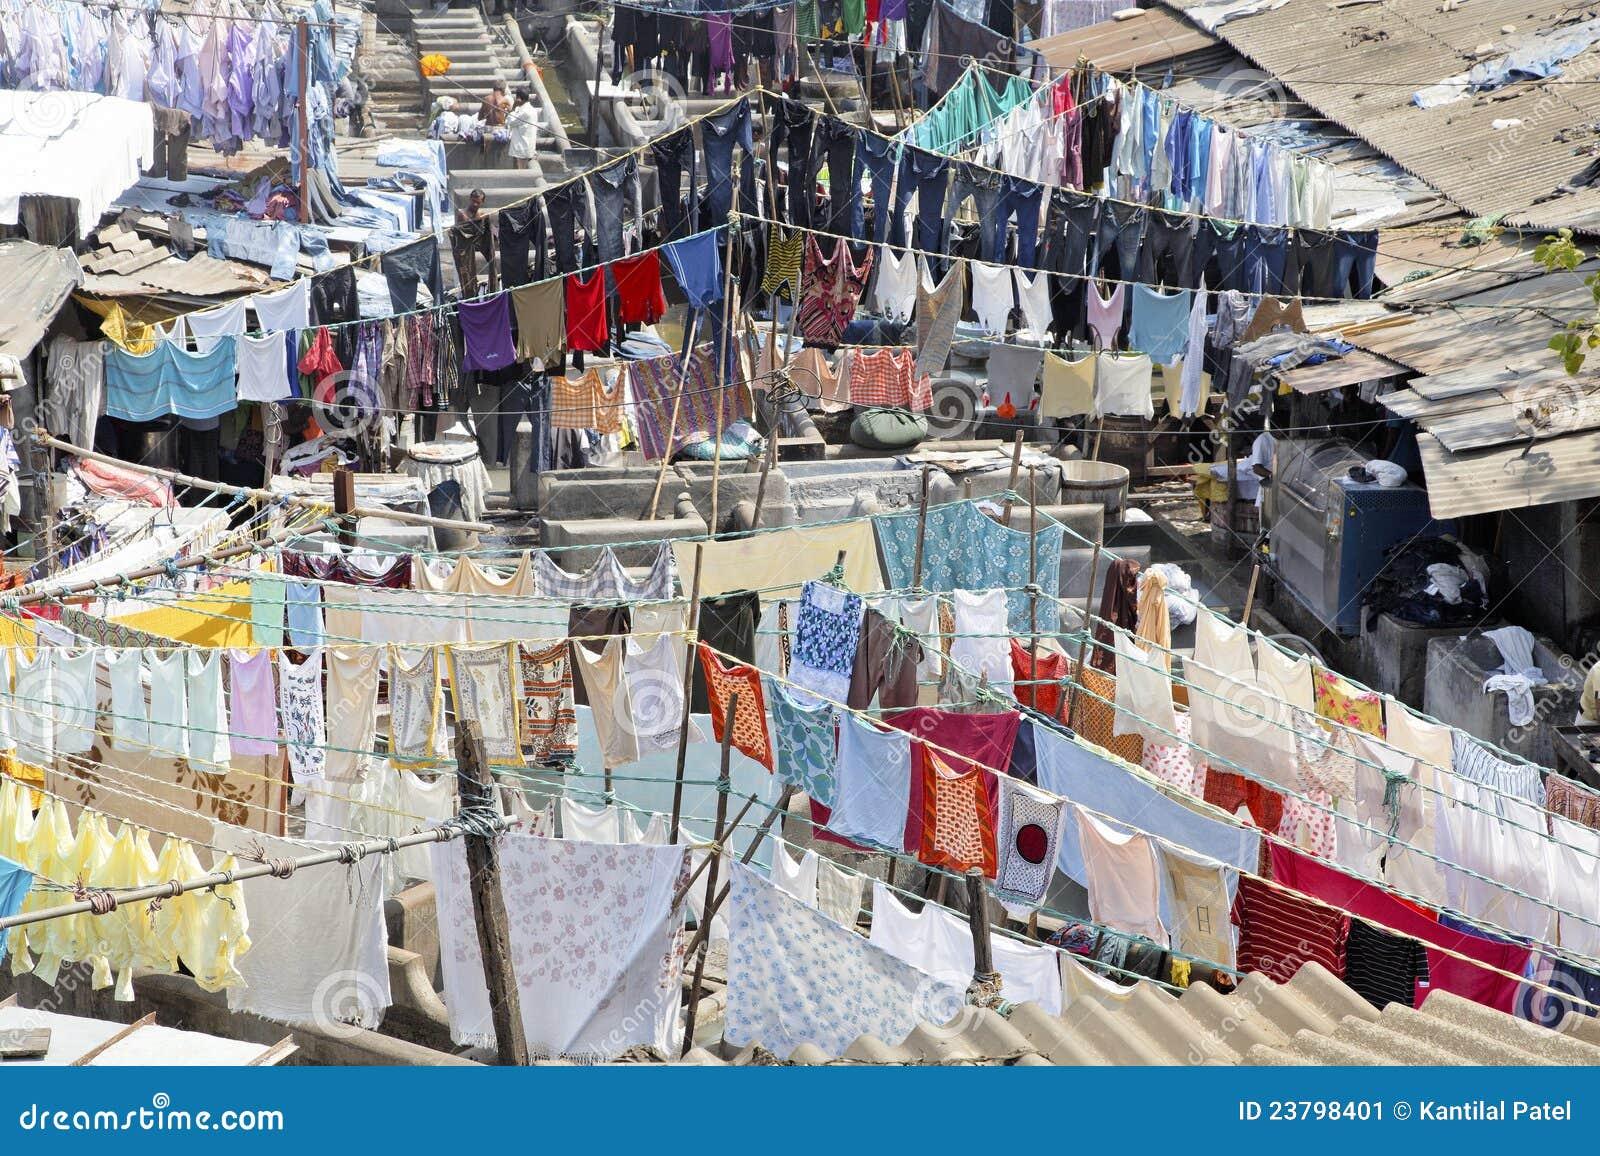 How Do I Start A Laundry Business?